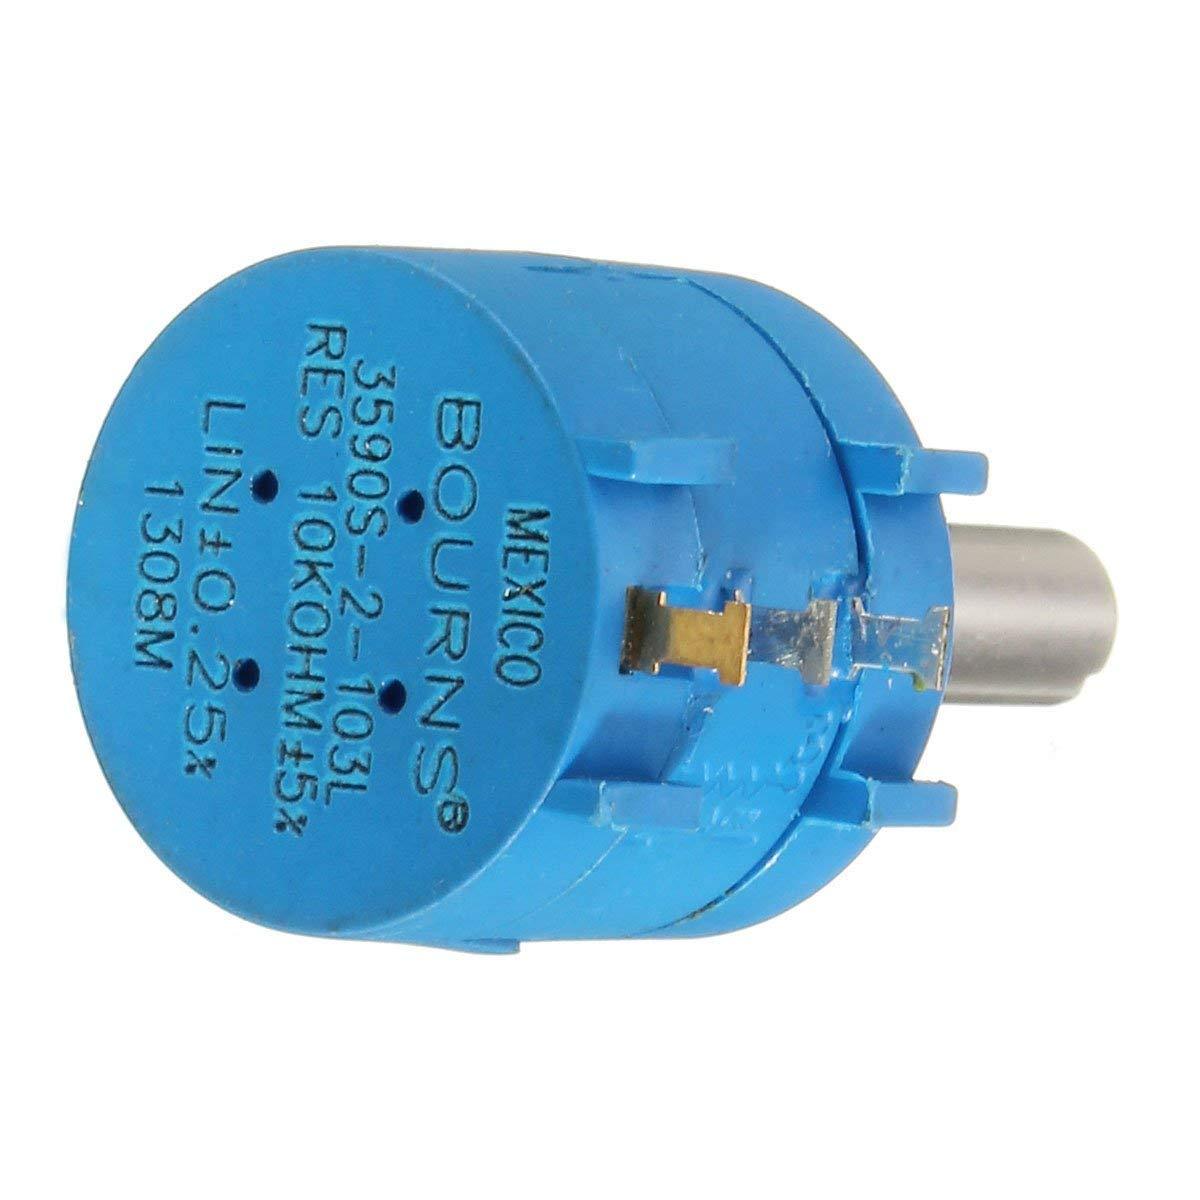 3590S-2-103L 10K Ohm 10-Turn Rotary Wire Wound Precision Potentiometer Pot